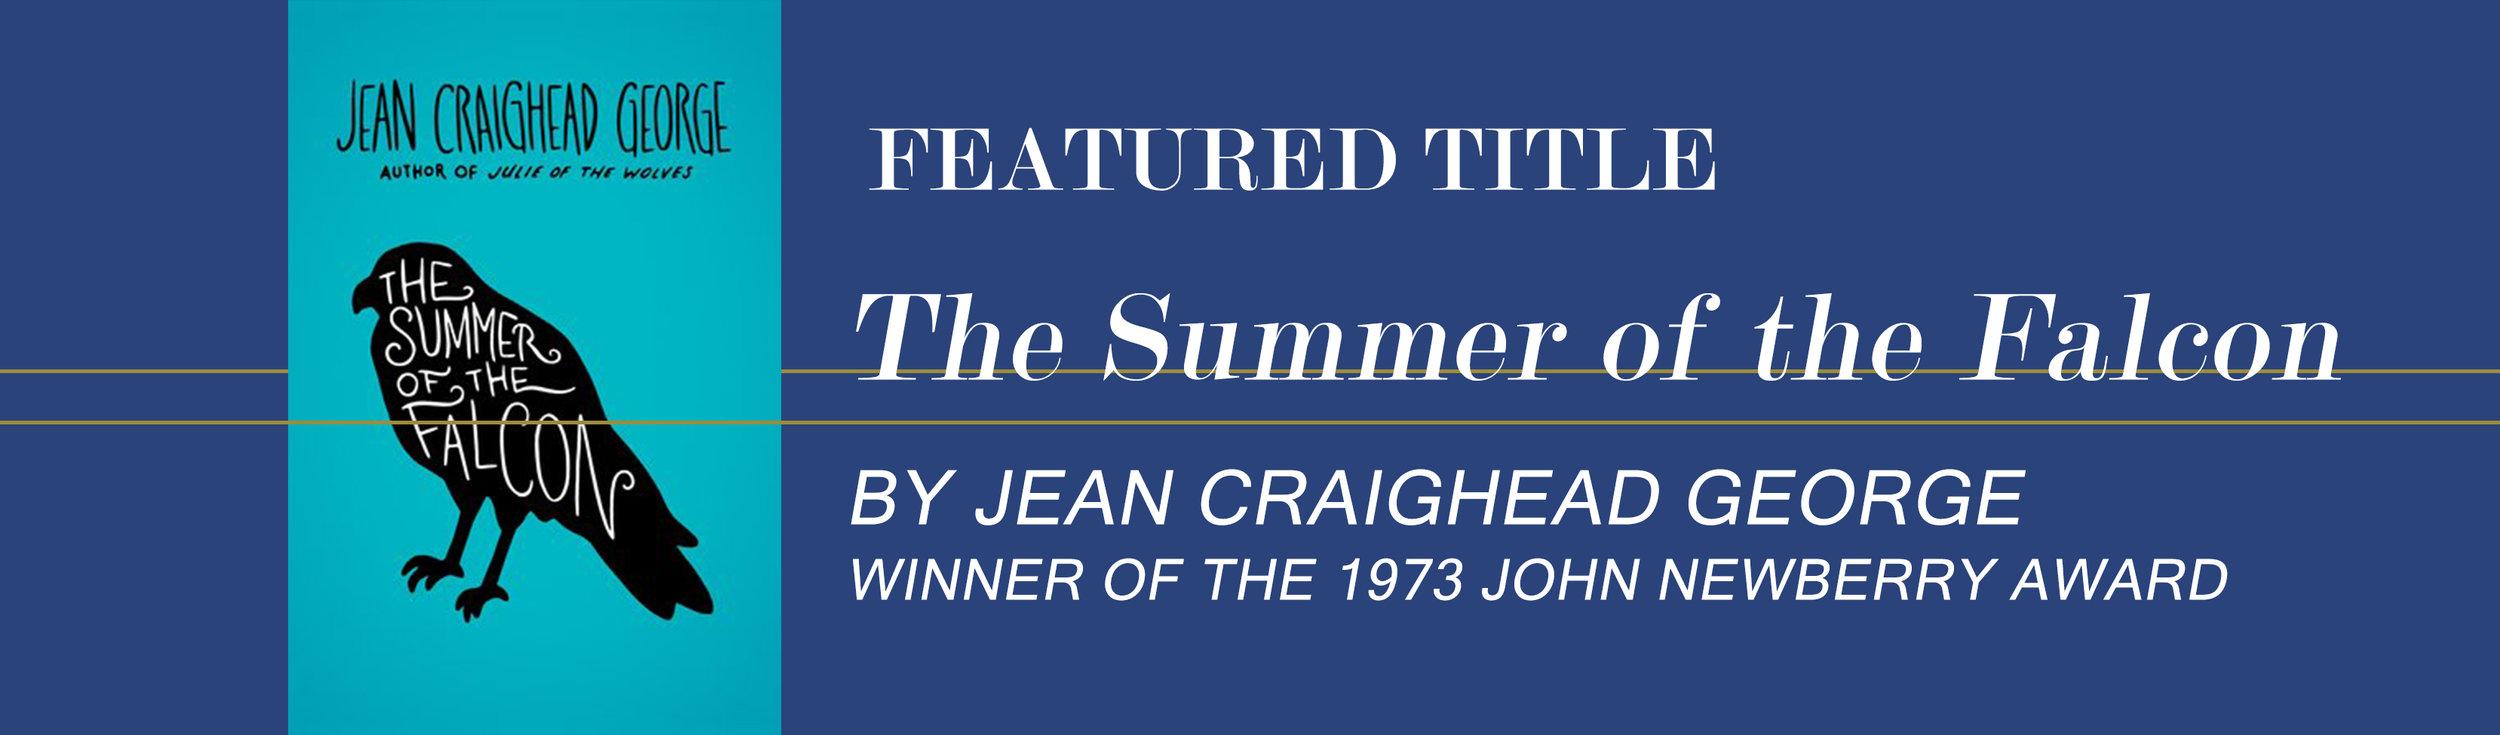 jean craighead george featured title.jpg